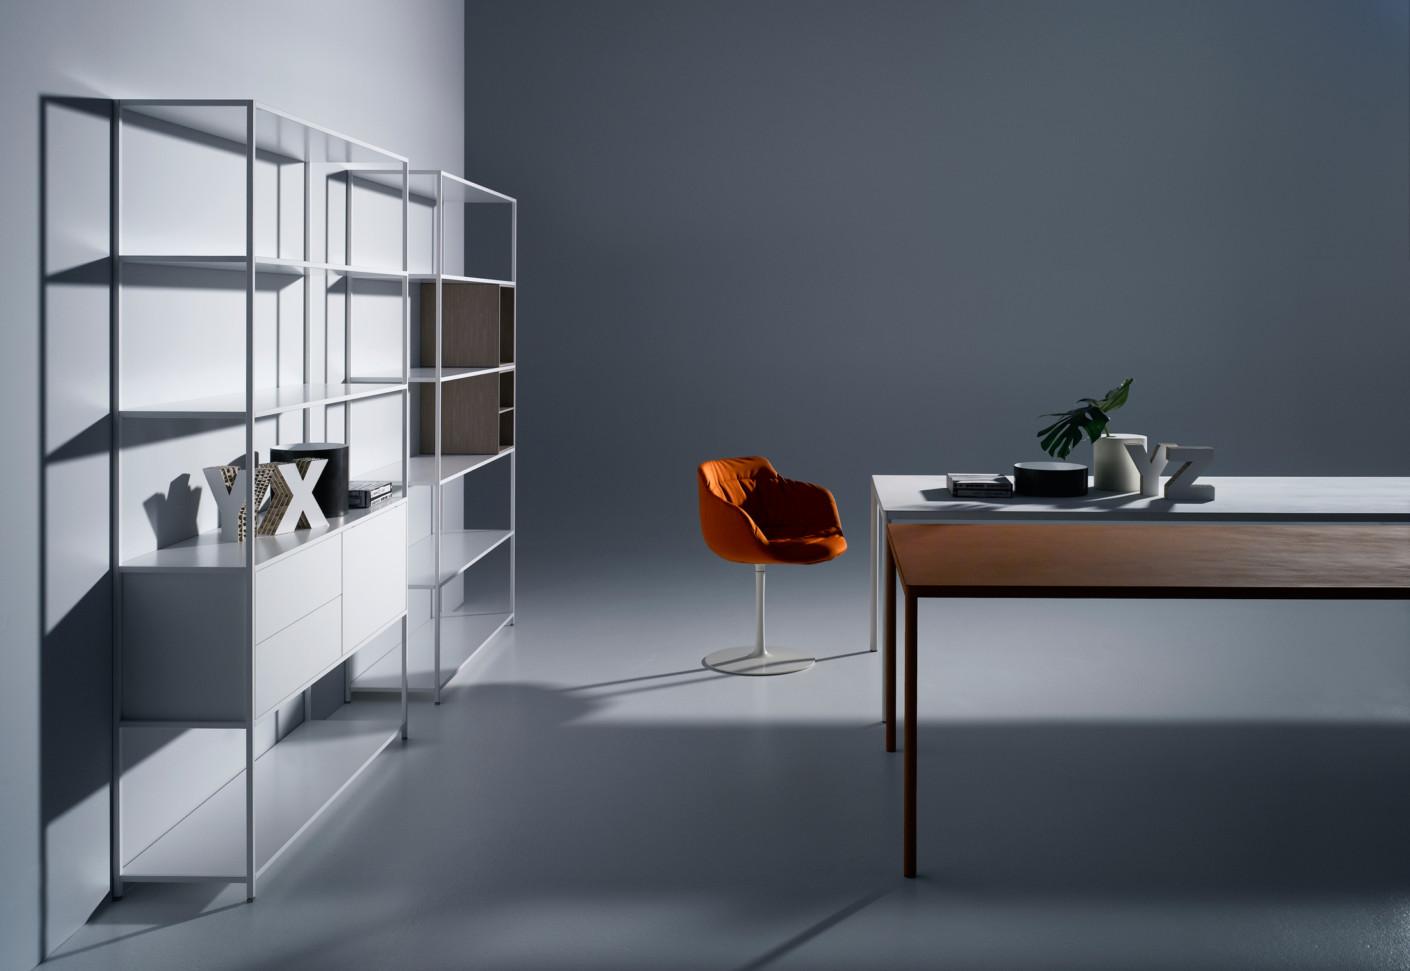 minima 3 0 von mdf italia stylepark. Black Bedroom Furniture Sets. Home Design Ideas